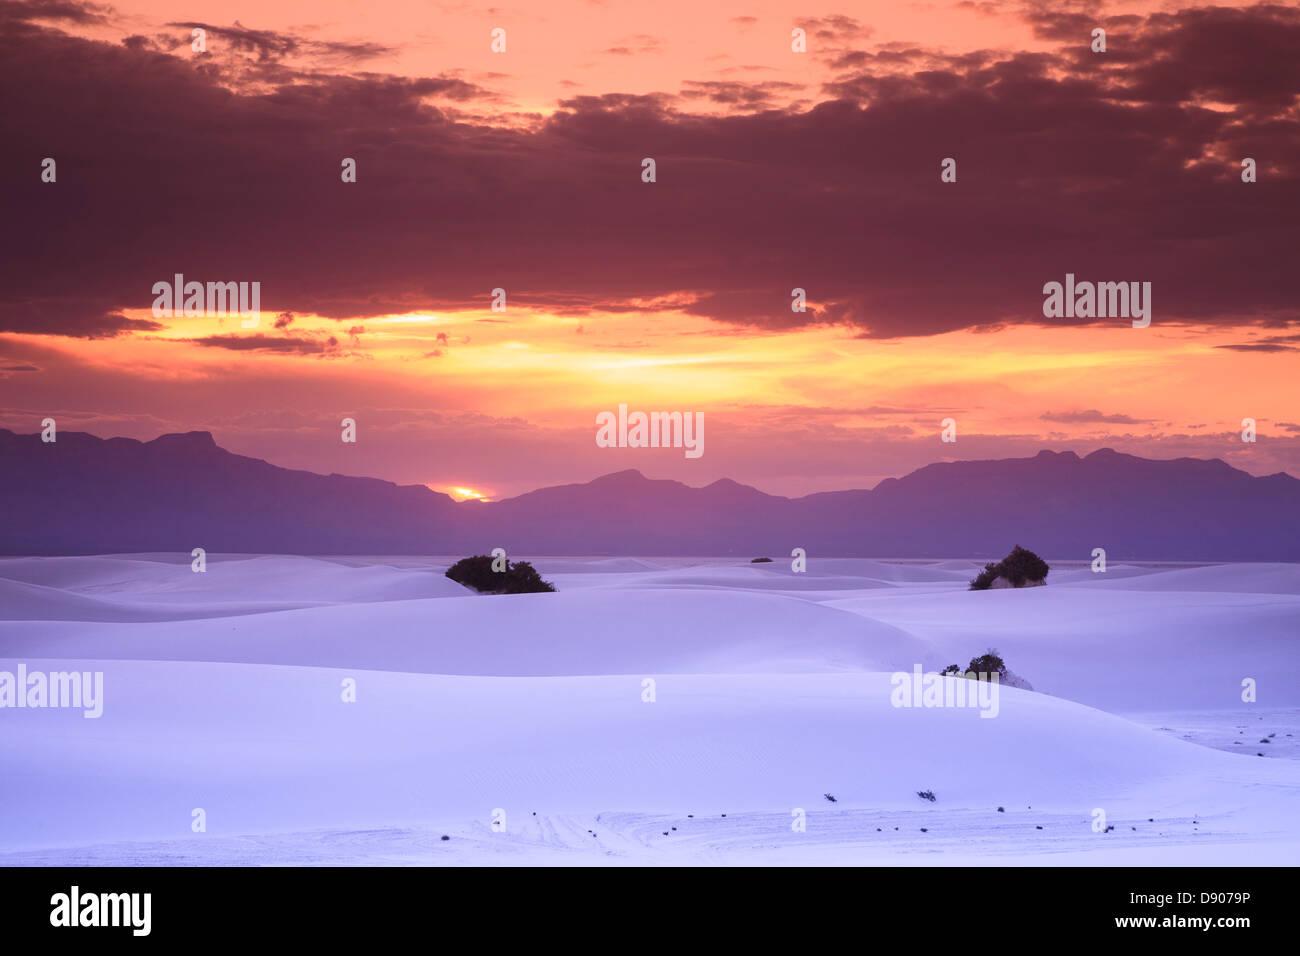 USA, New Mexico, White Sands National Monum - Stock Image